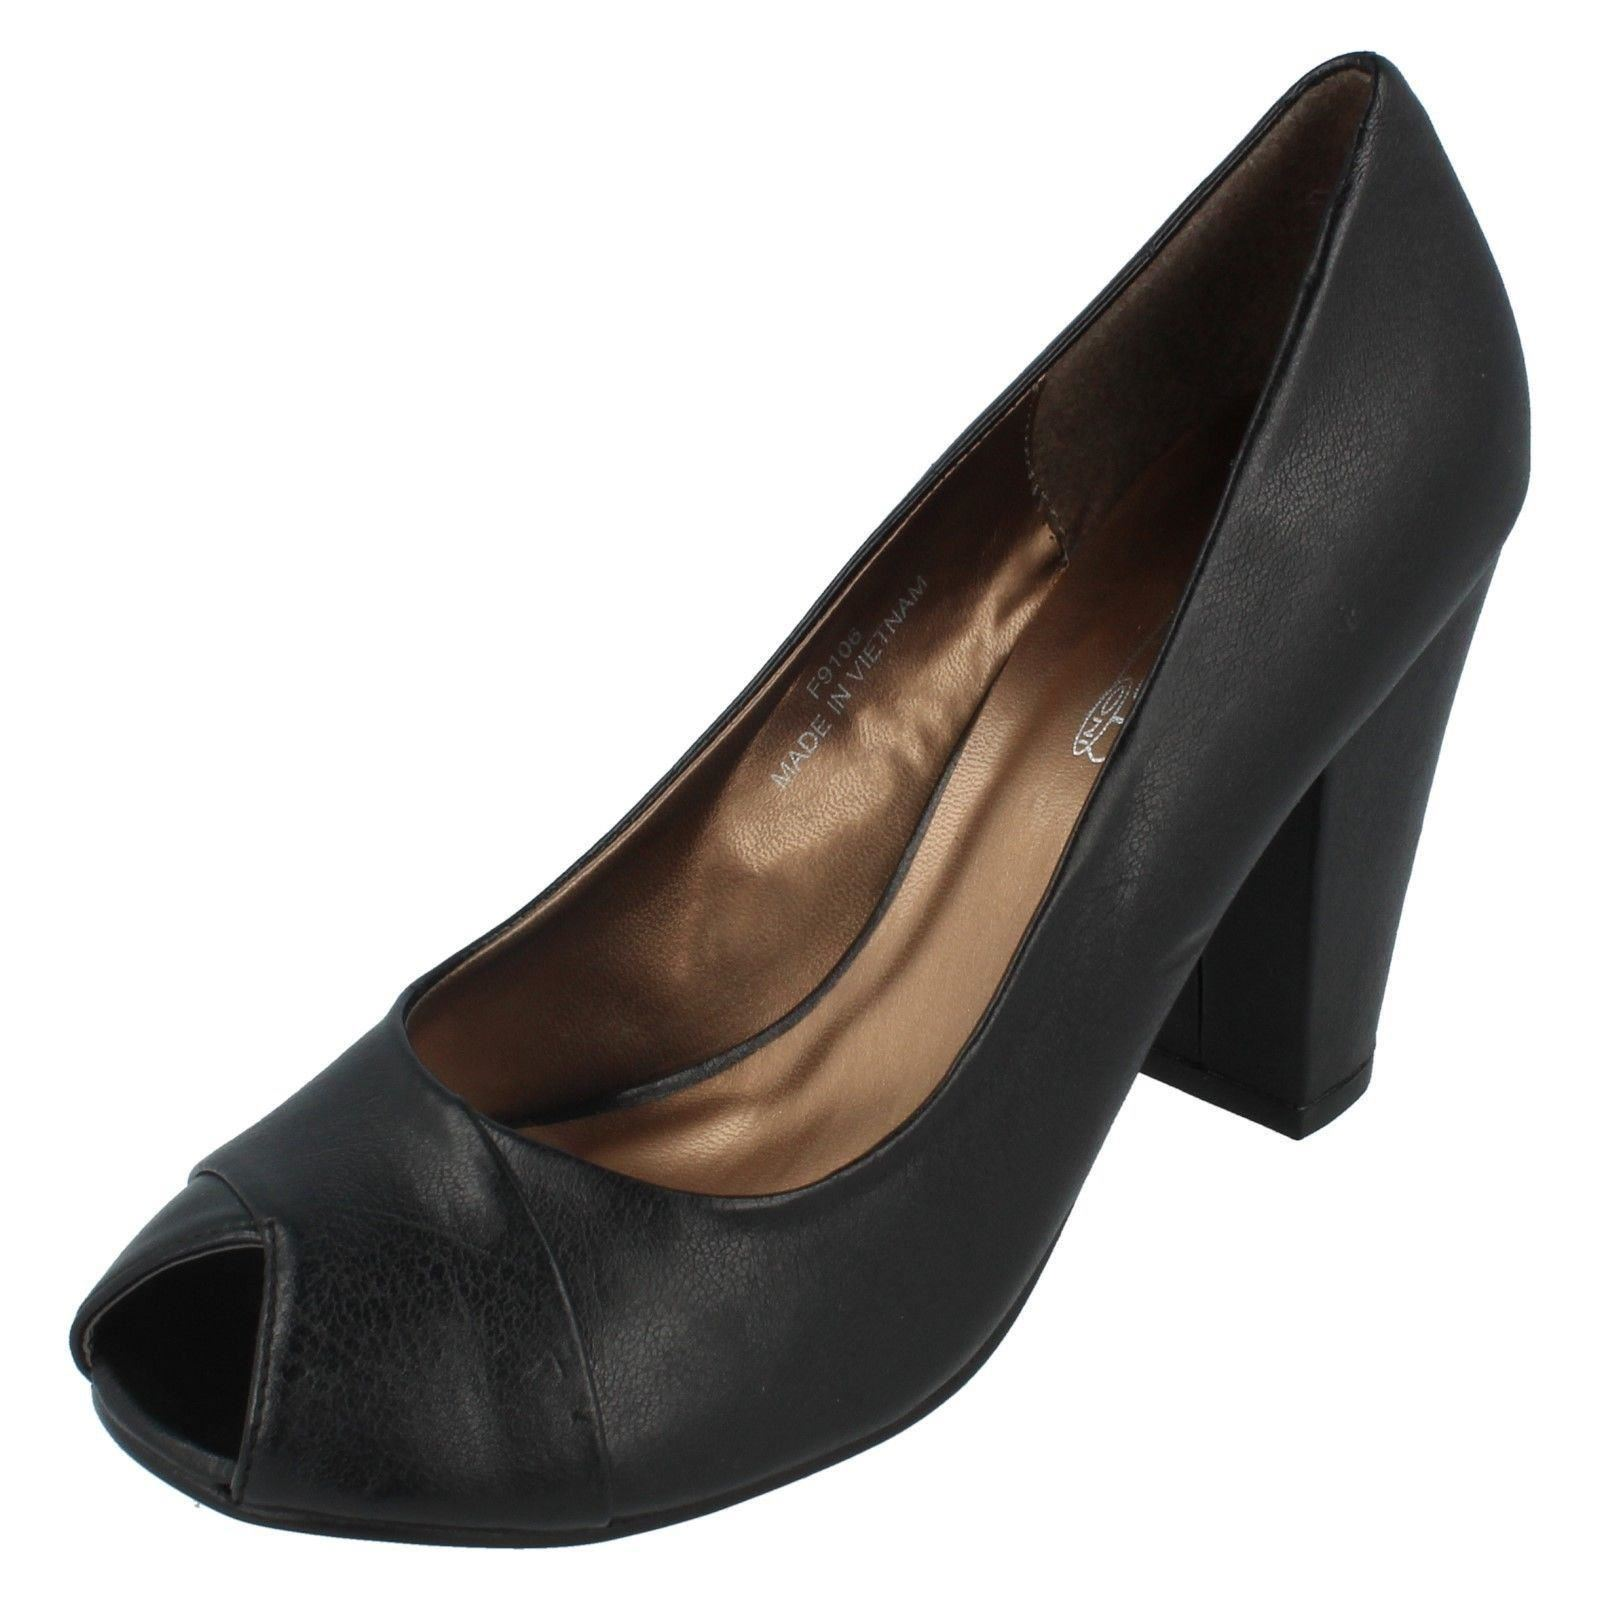 Damas Spot on resbalón en Punta Abierta Zapatos Etiqueta F9106 ~ N